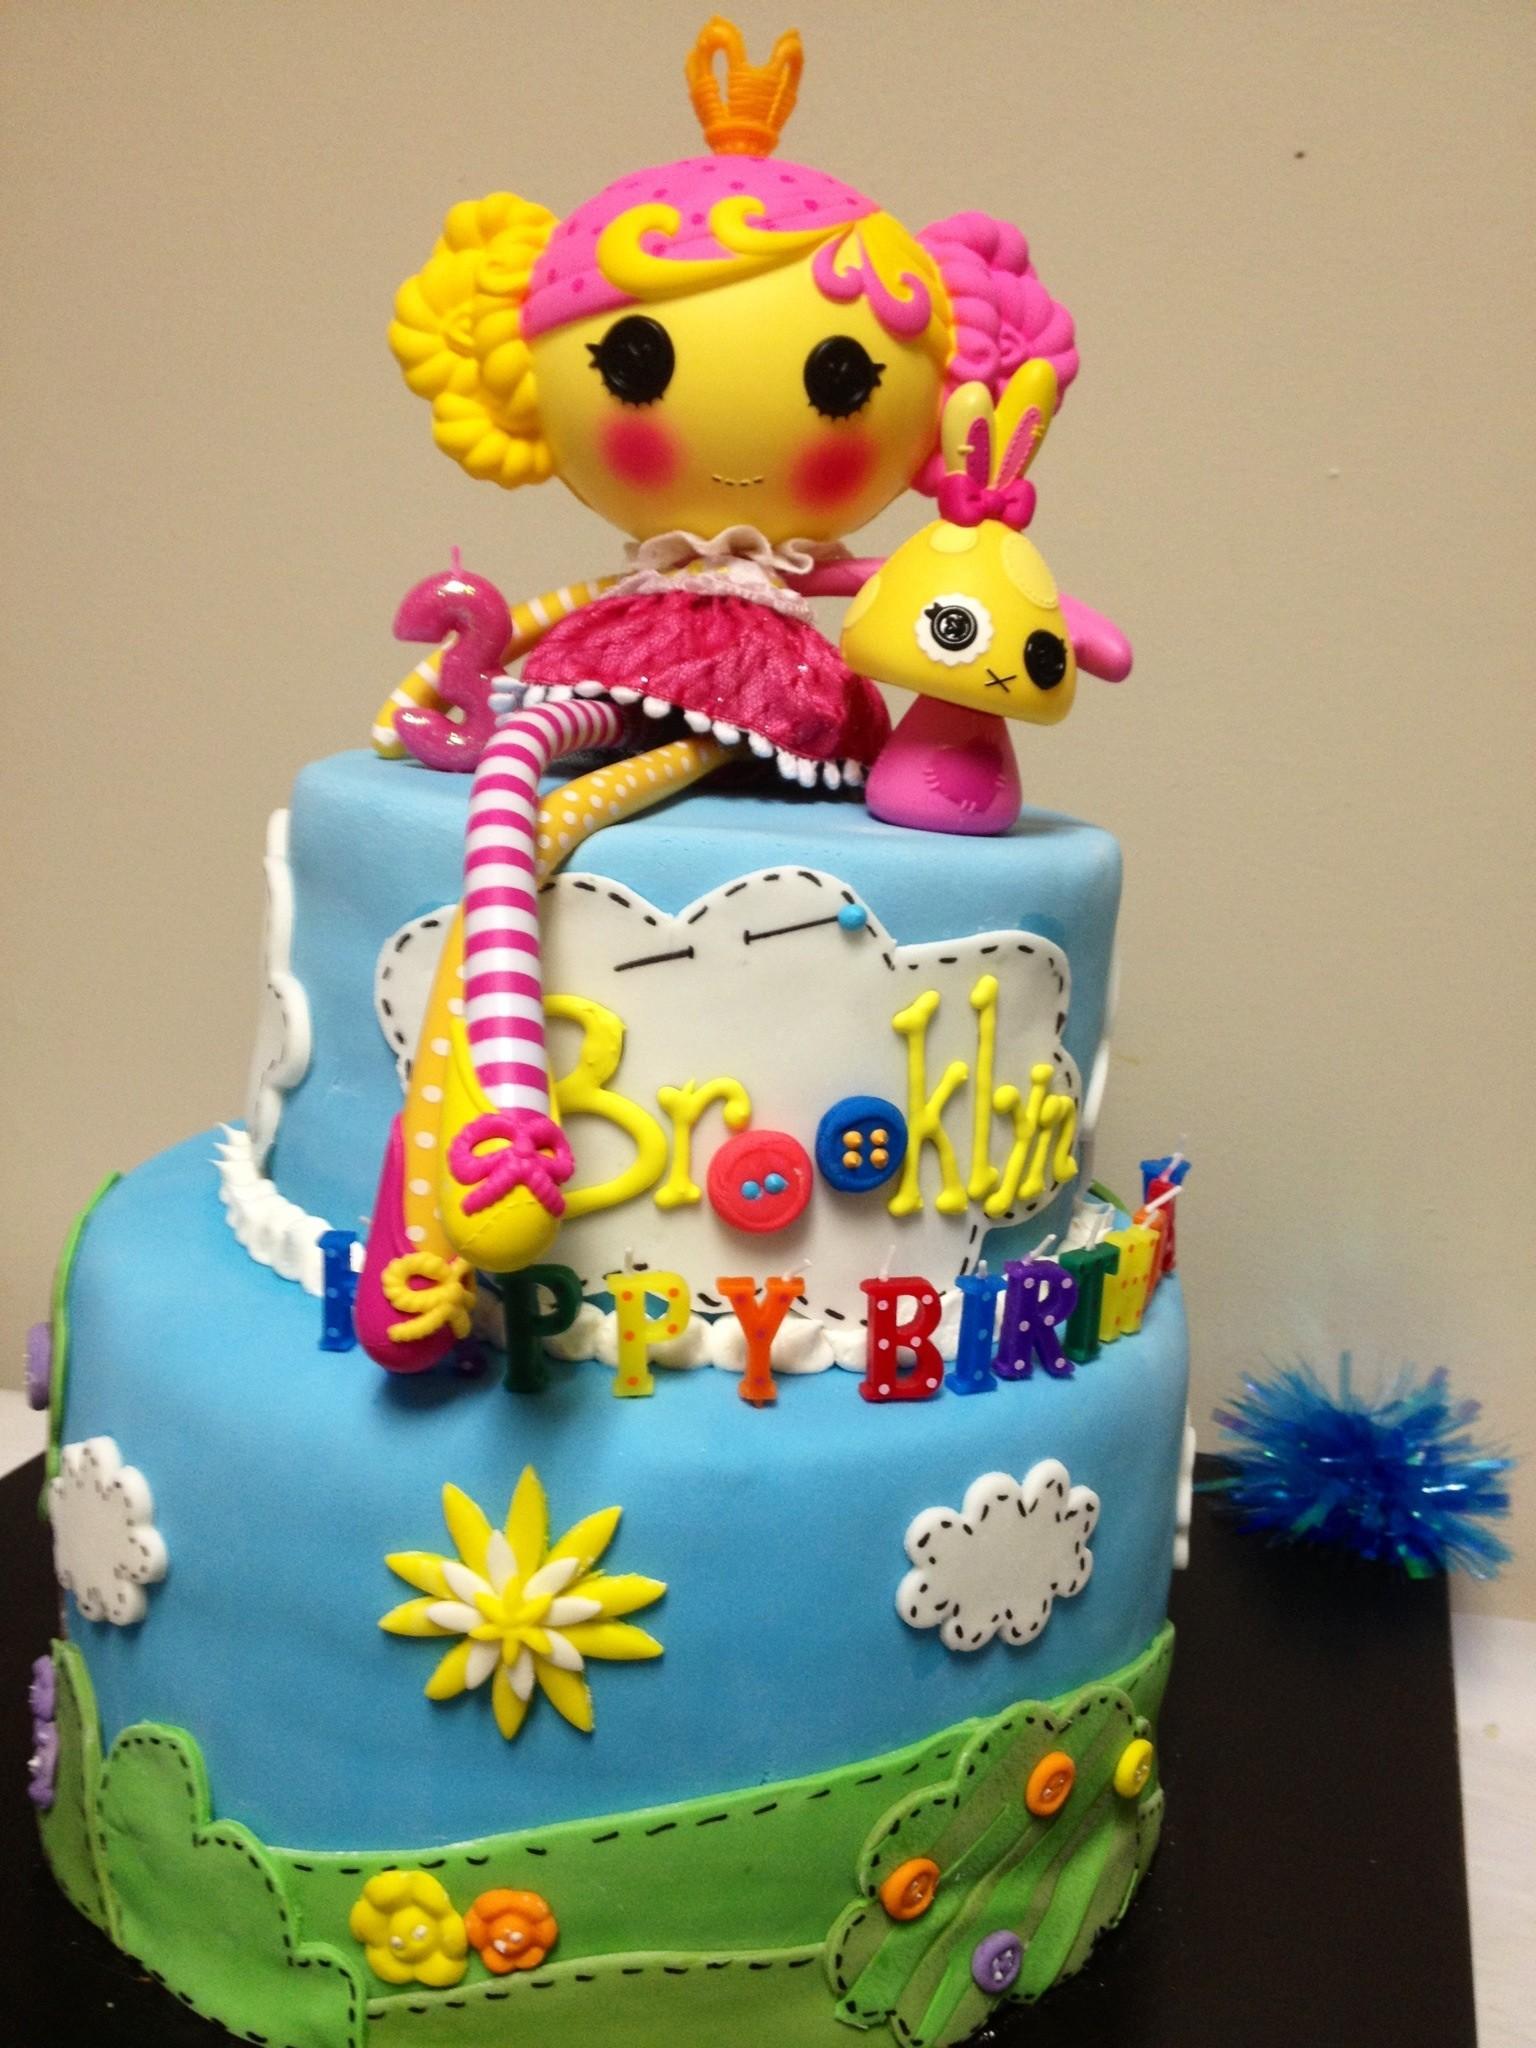 Brooklyn S Cool Lalaloopsy Cake